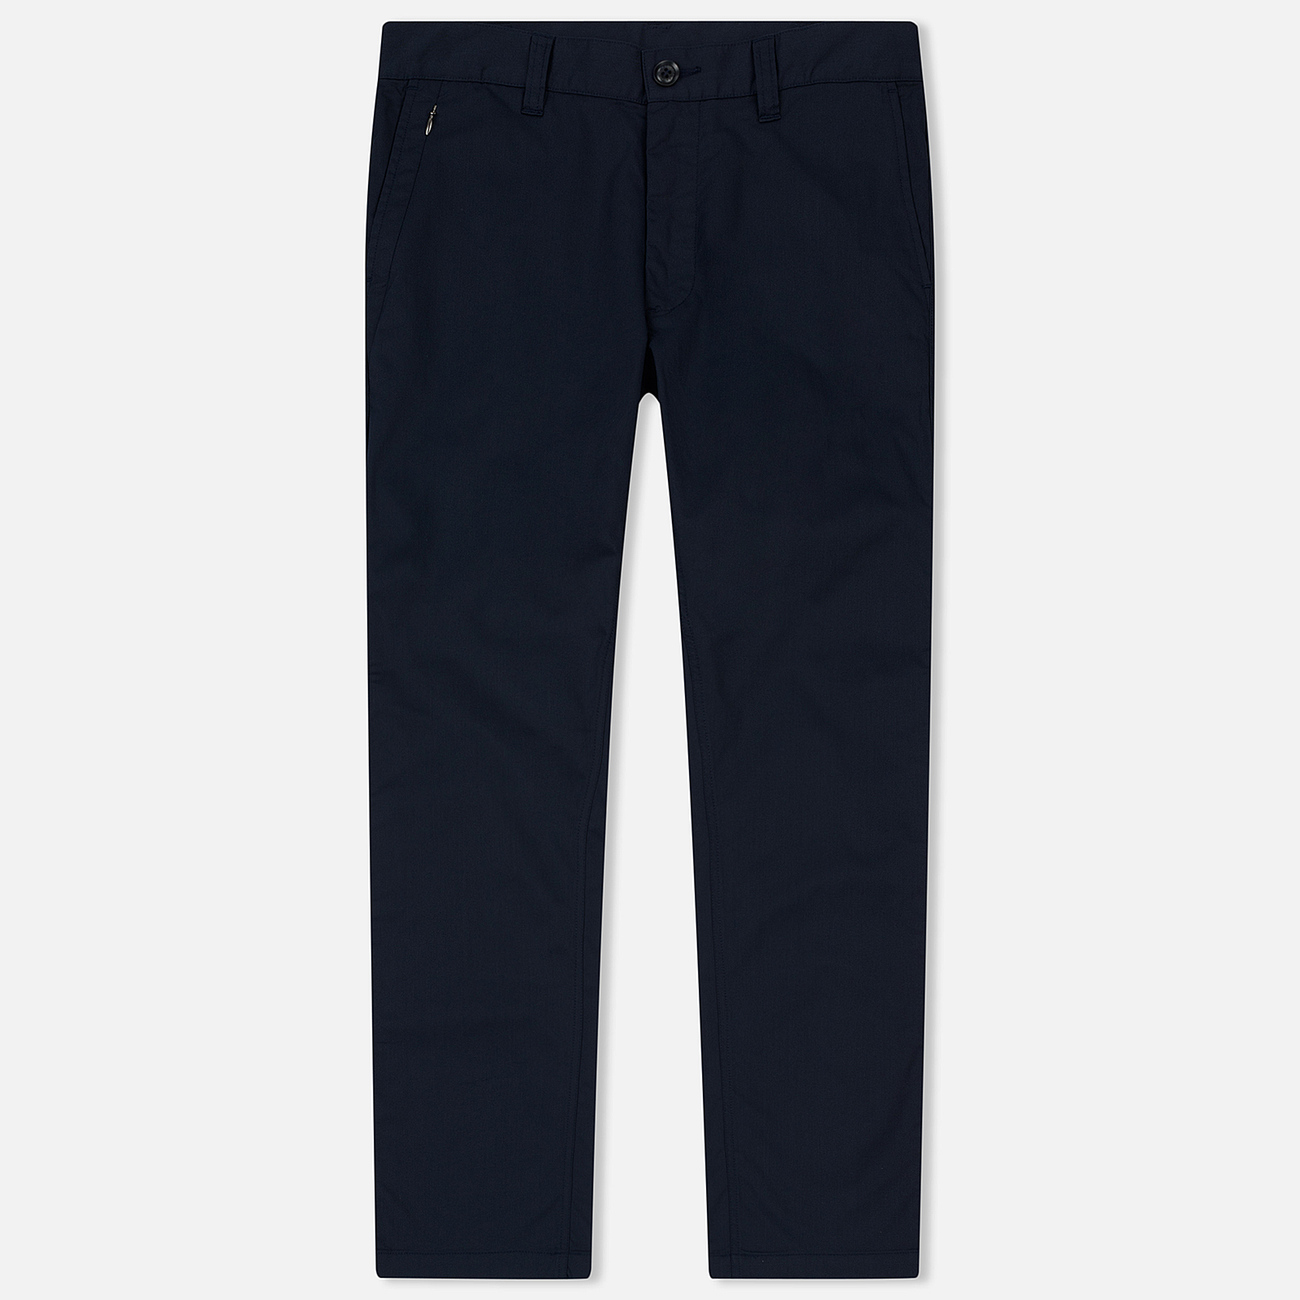 Мужские брюки Nanamica Club Poliester/Cotton Navy